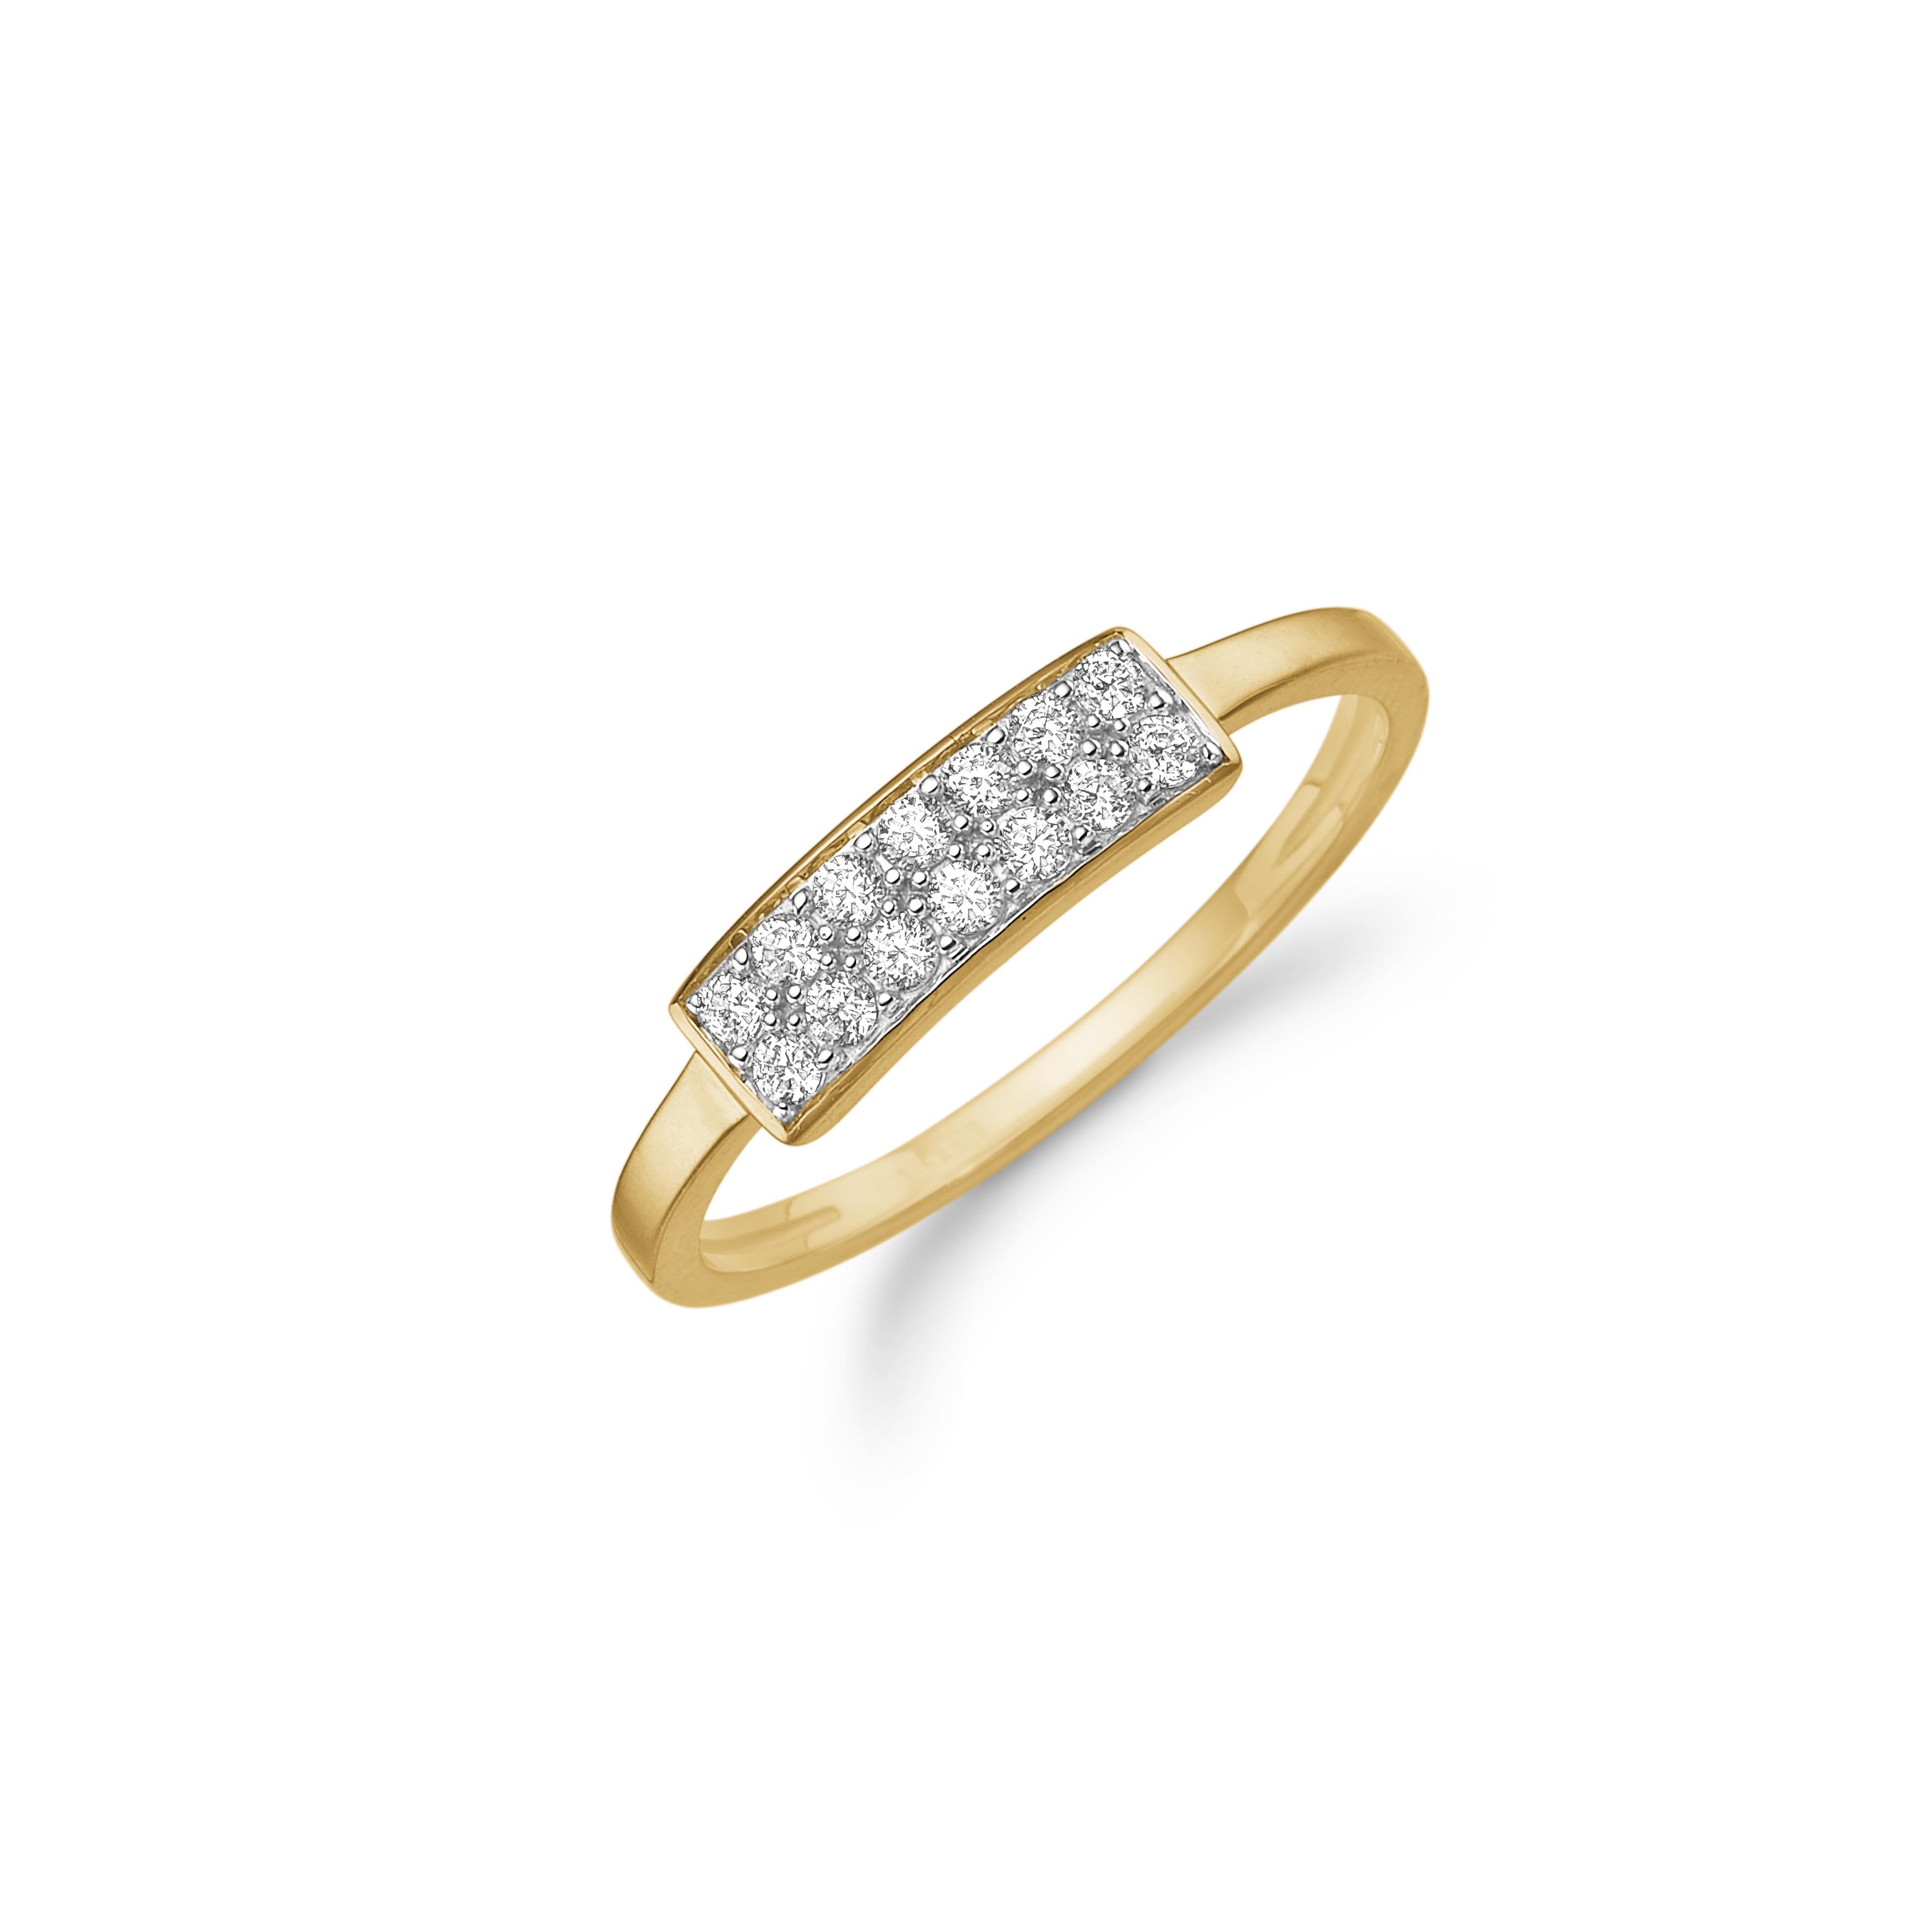 8 kt ring med zirkonia - 08622286-75 størrelse 52 fra aagaard på brodersen + kobborg